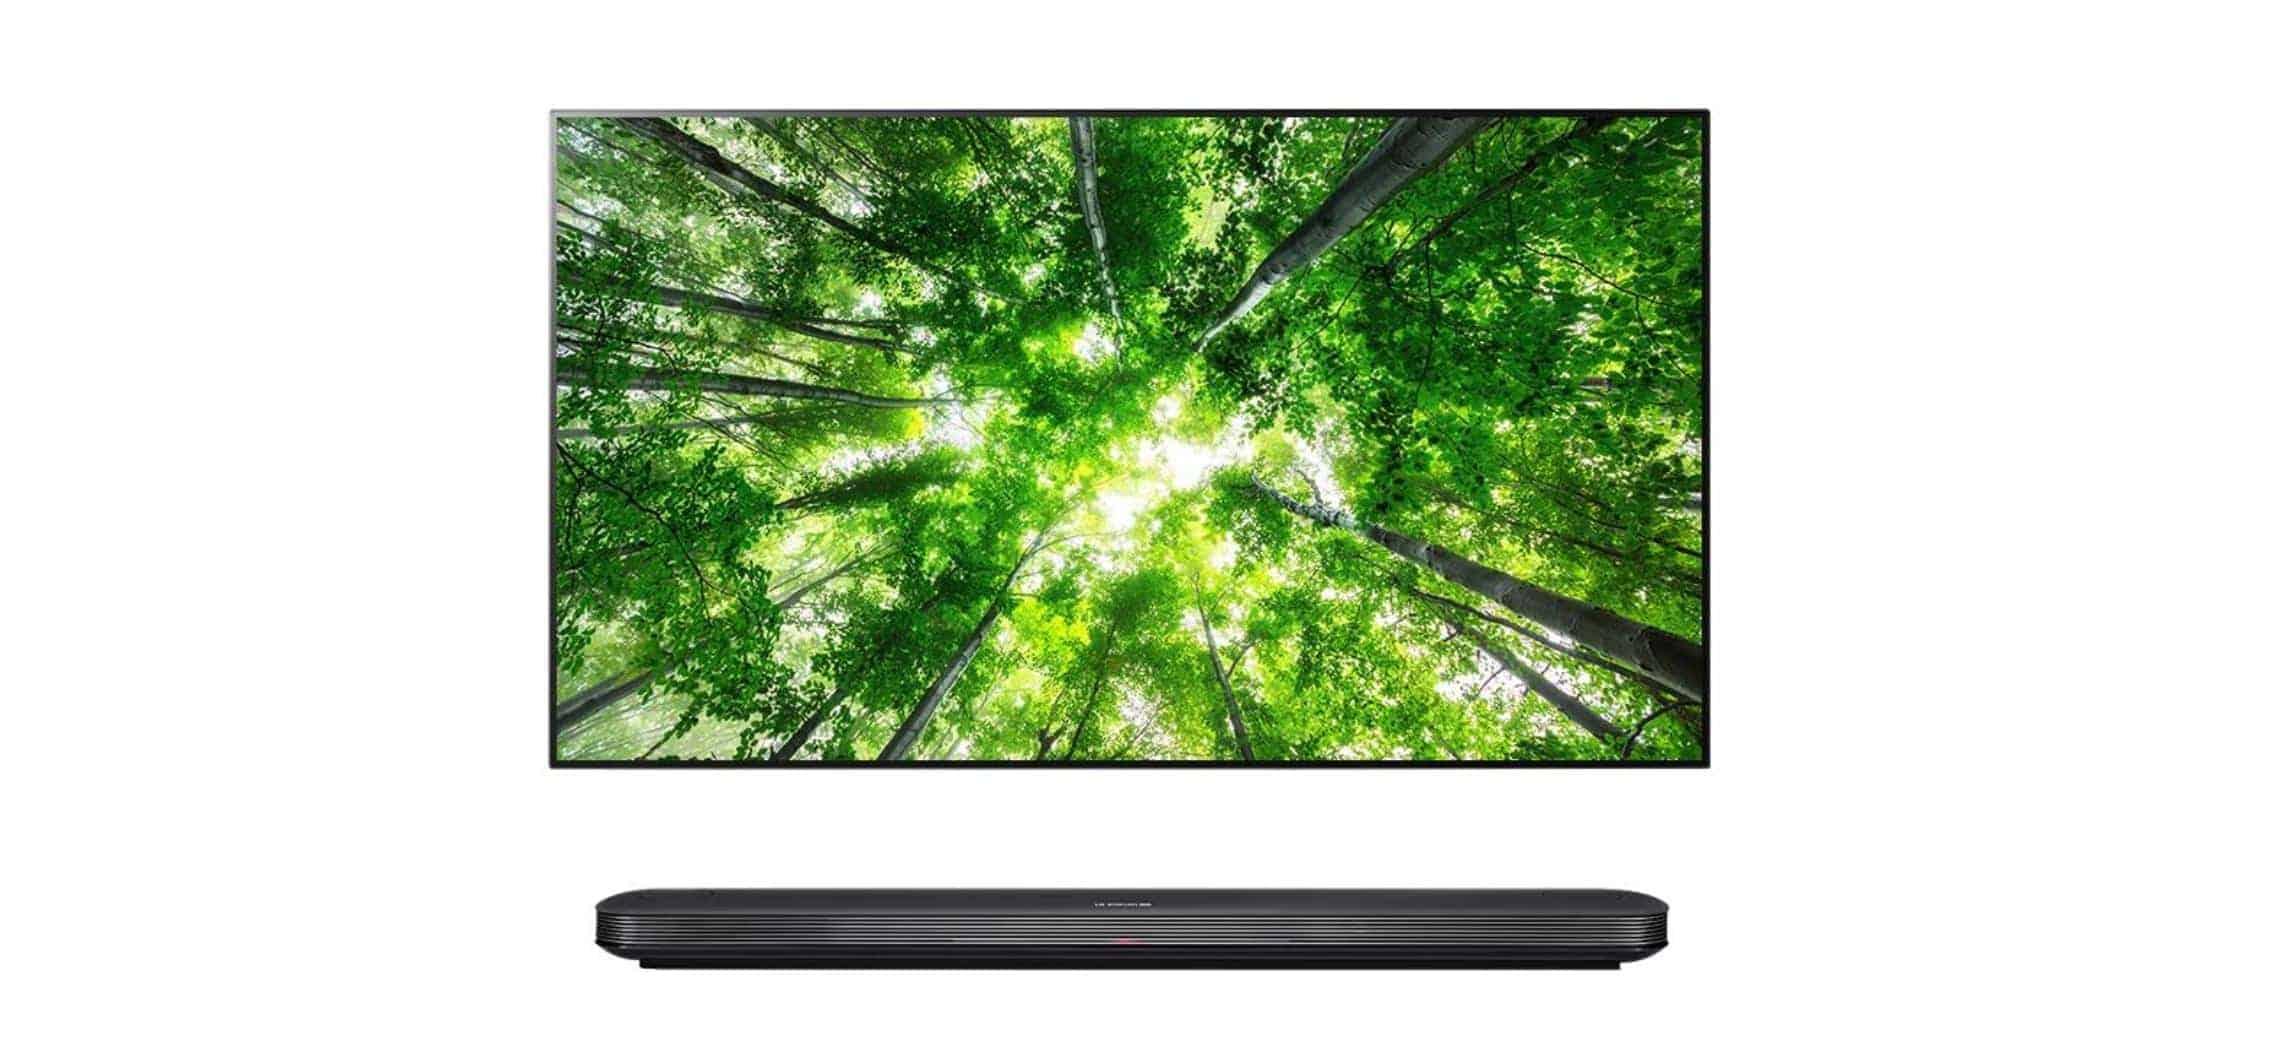 LG Signature OLED TV W8